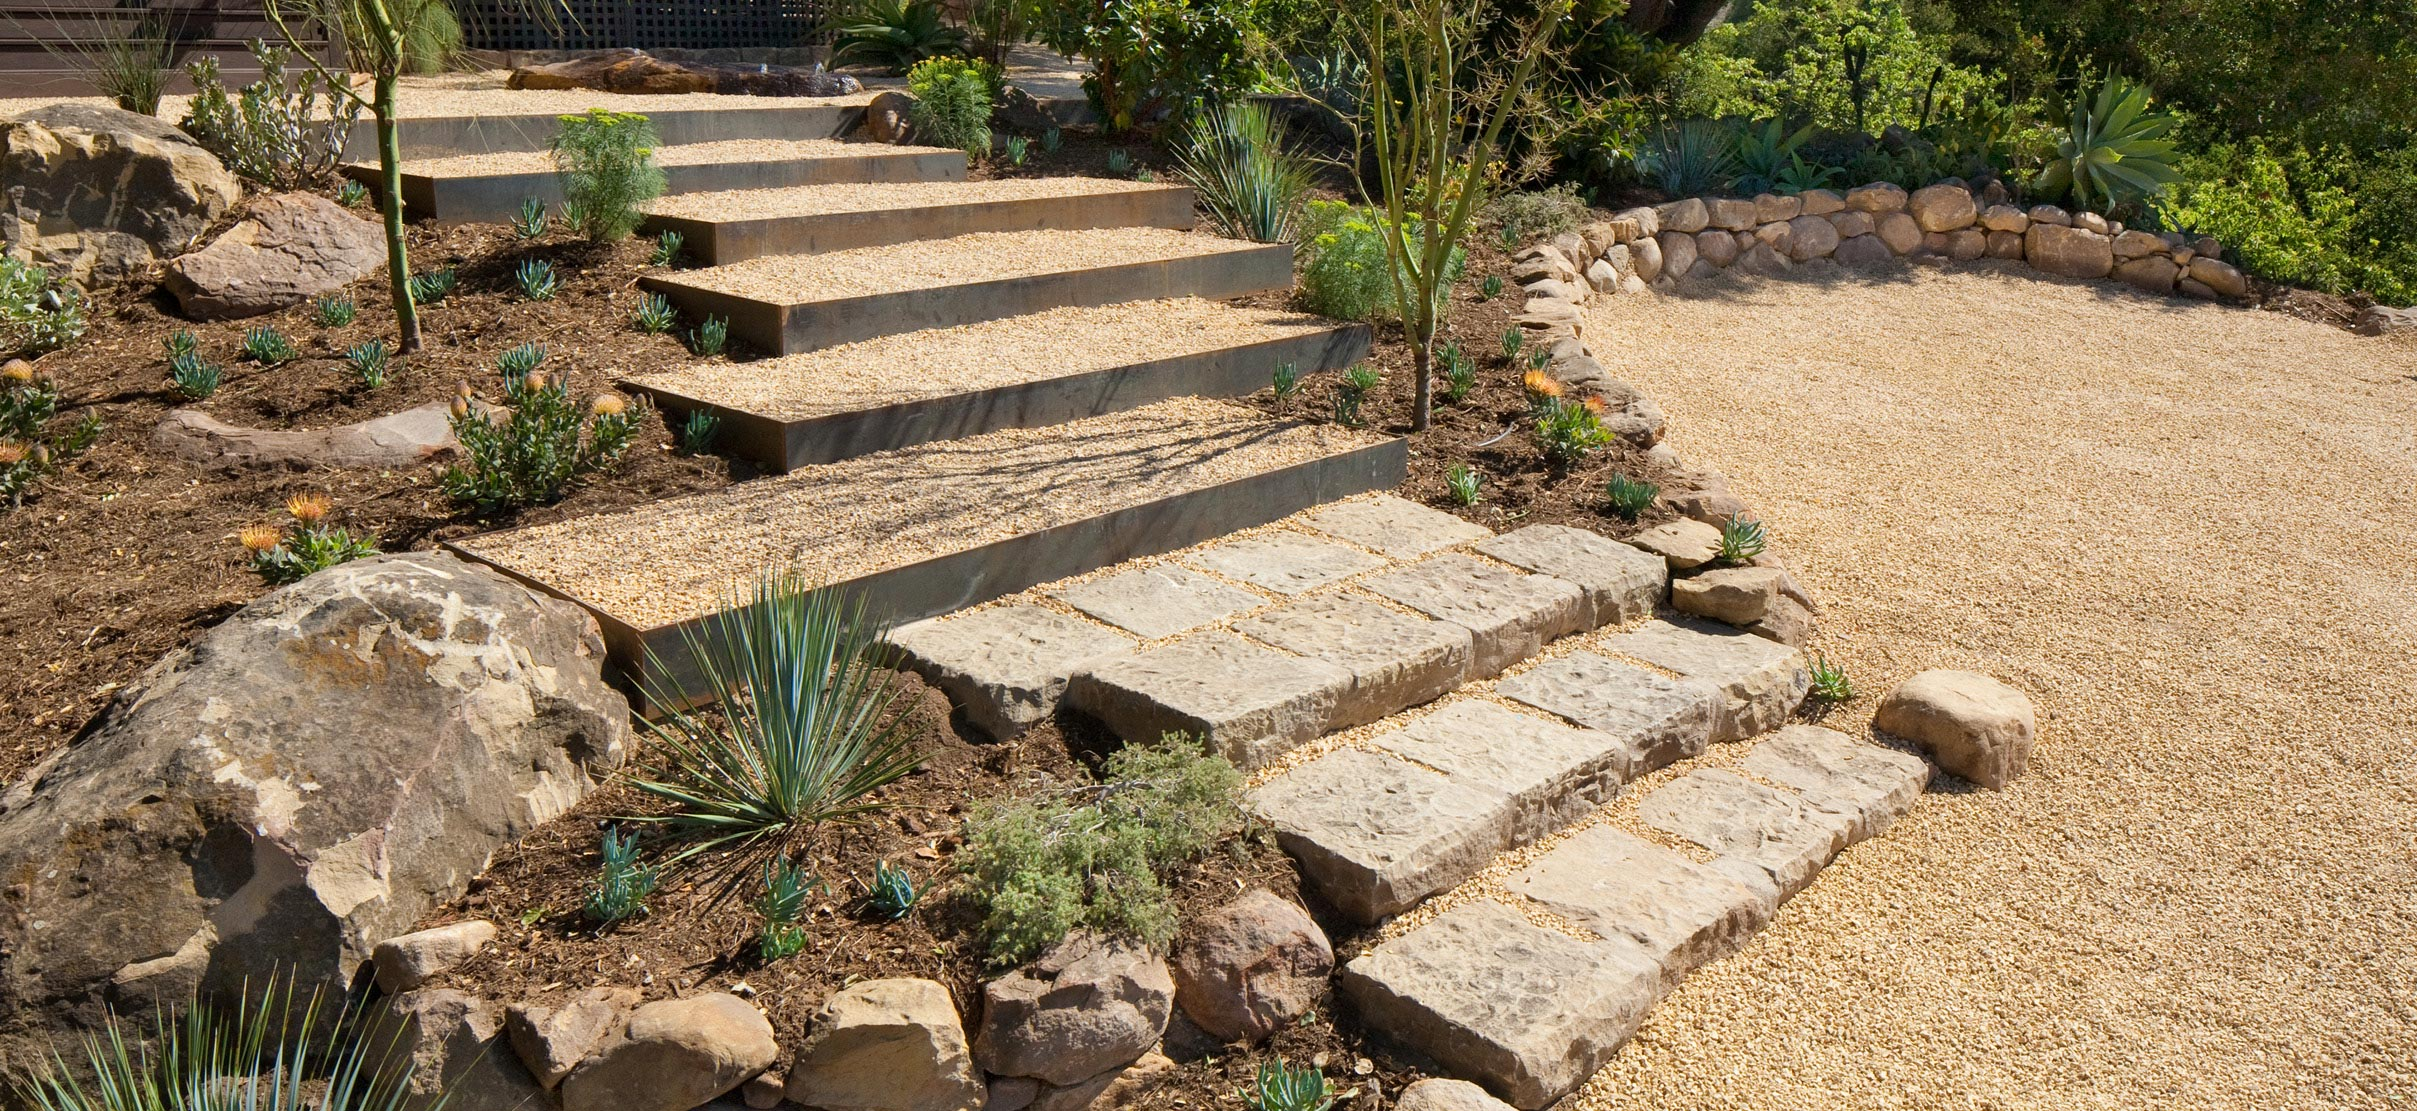 6-entry-stairs-stone-gravel.jpg